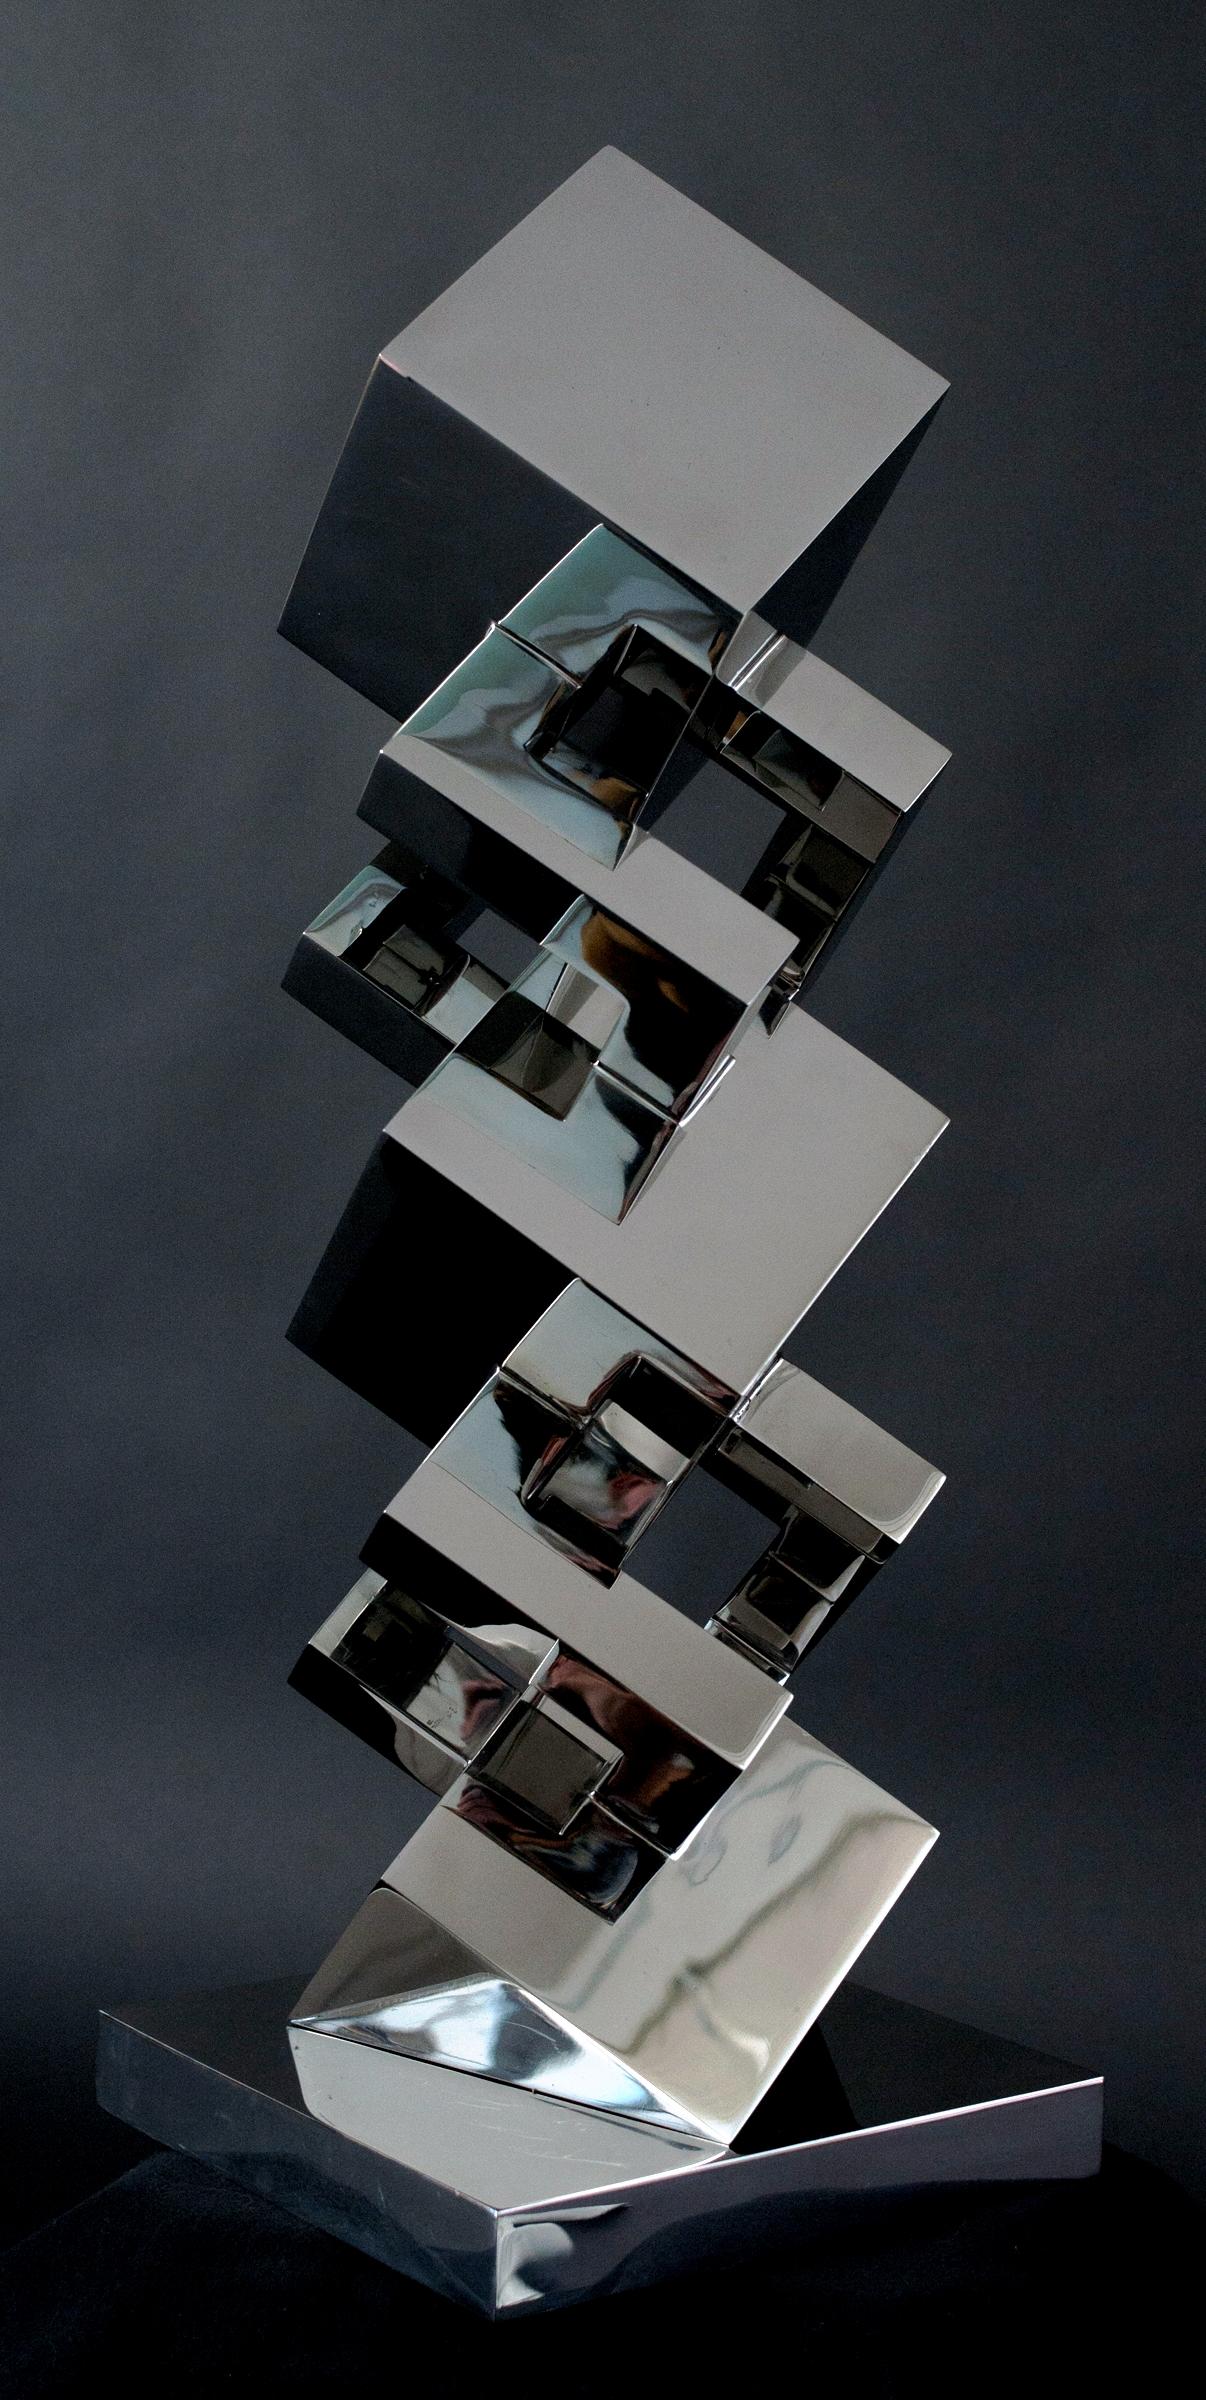 Cubexistentialism-1.jpg